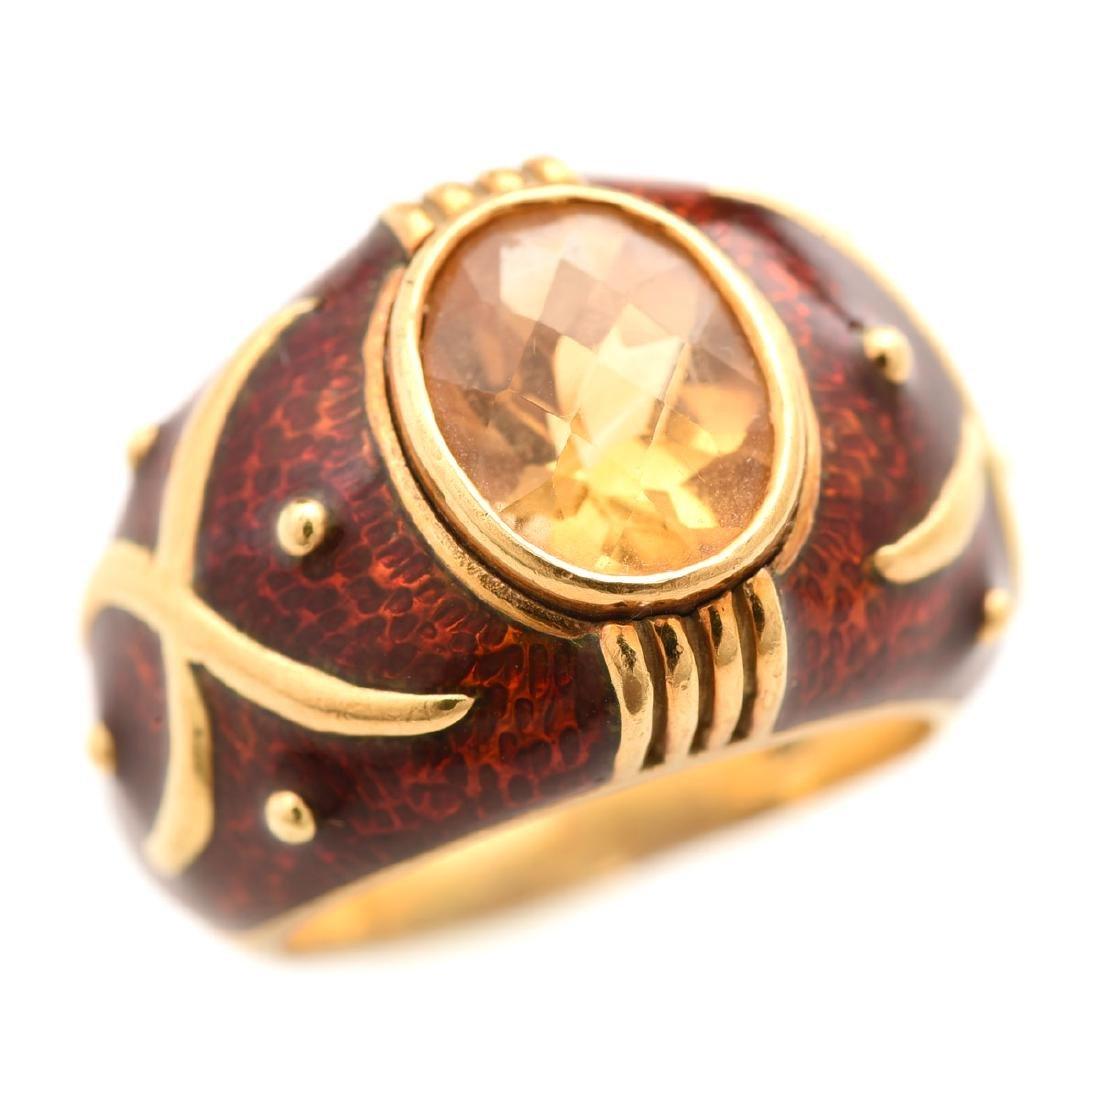 Citrine, Guilloche Enamel, 18k Yellow Gold Ring.